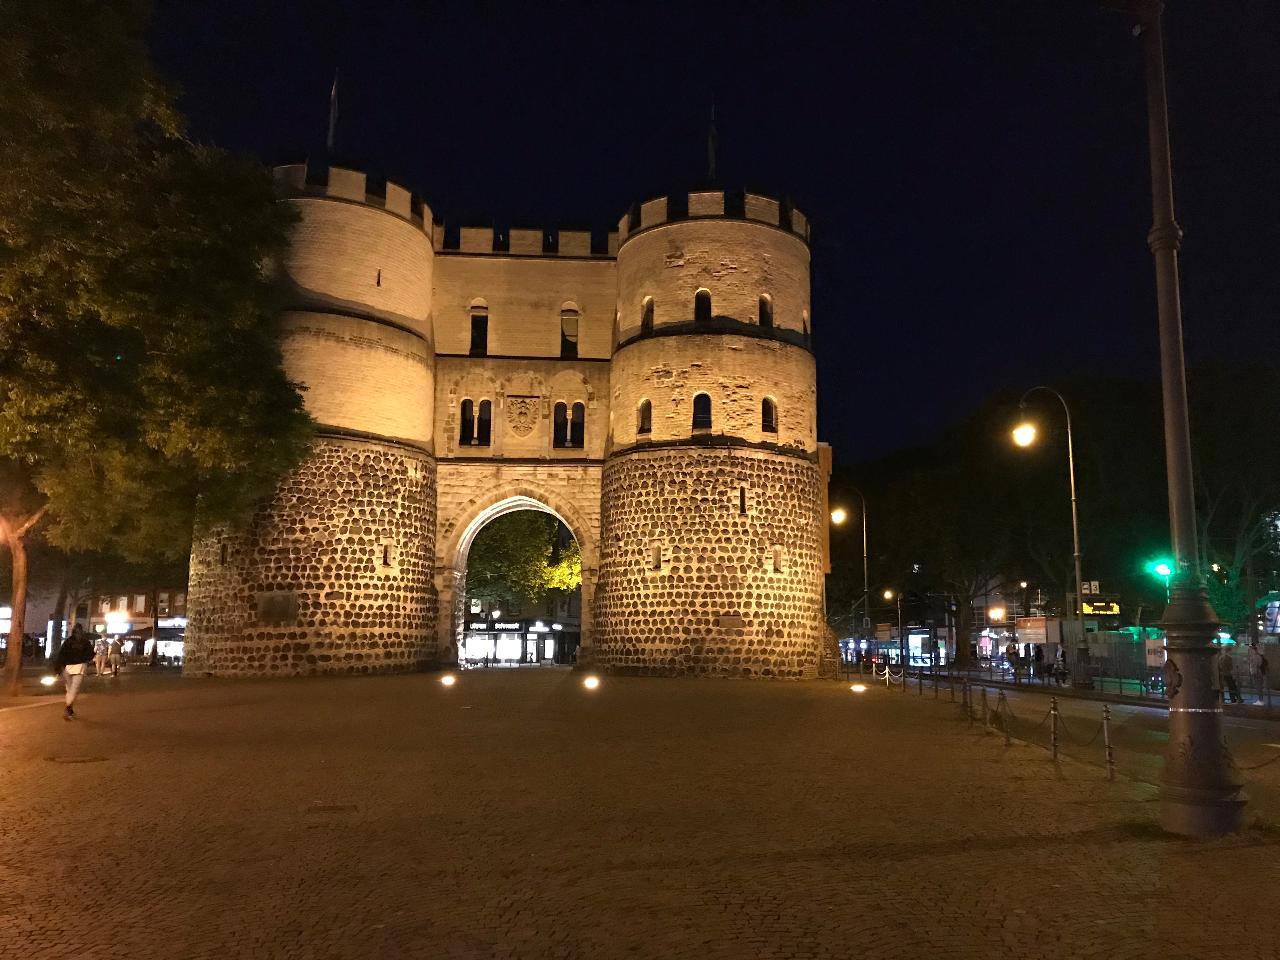 Cologne: Haunted Cologne City Exploration Game & Tour